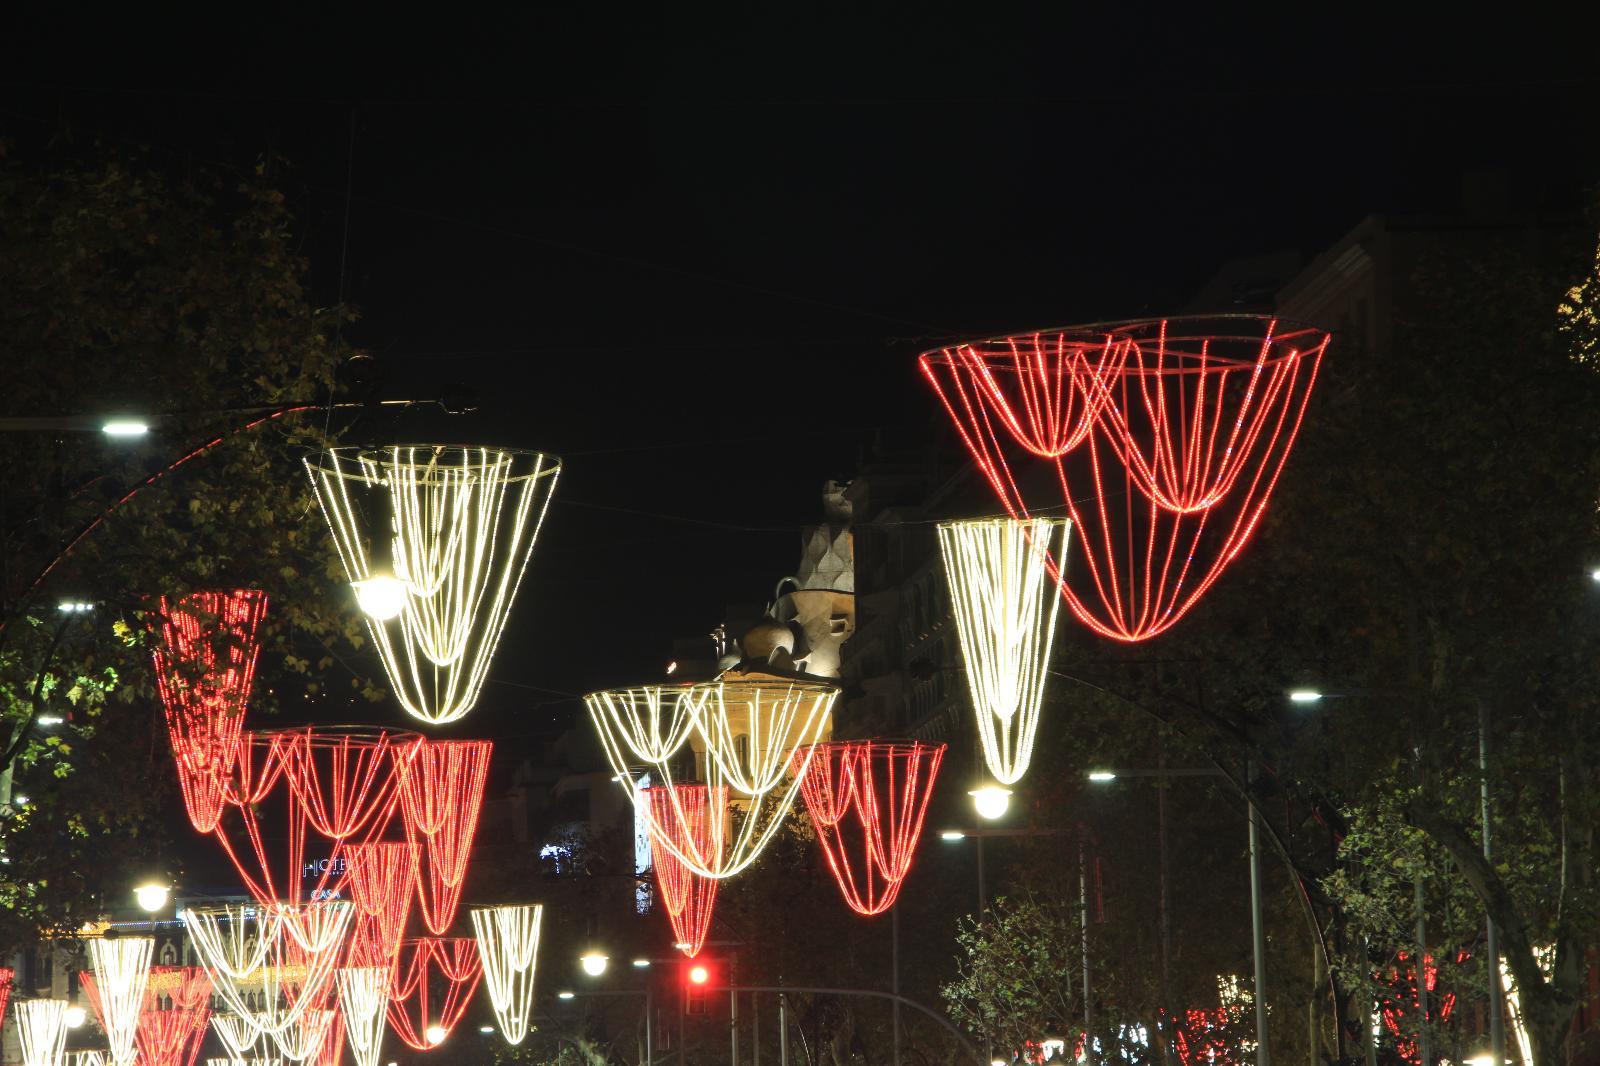 iluminacion-del-pg-de-gracia-barcelona-24956